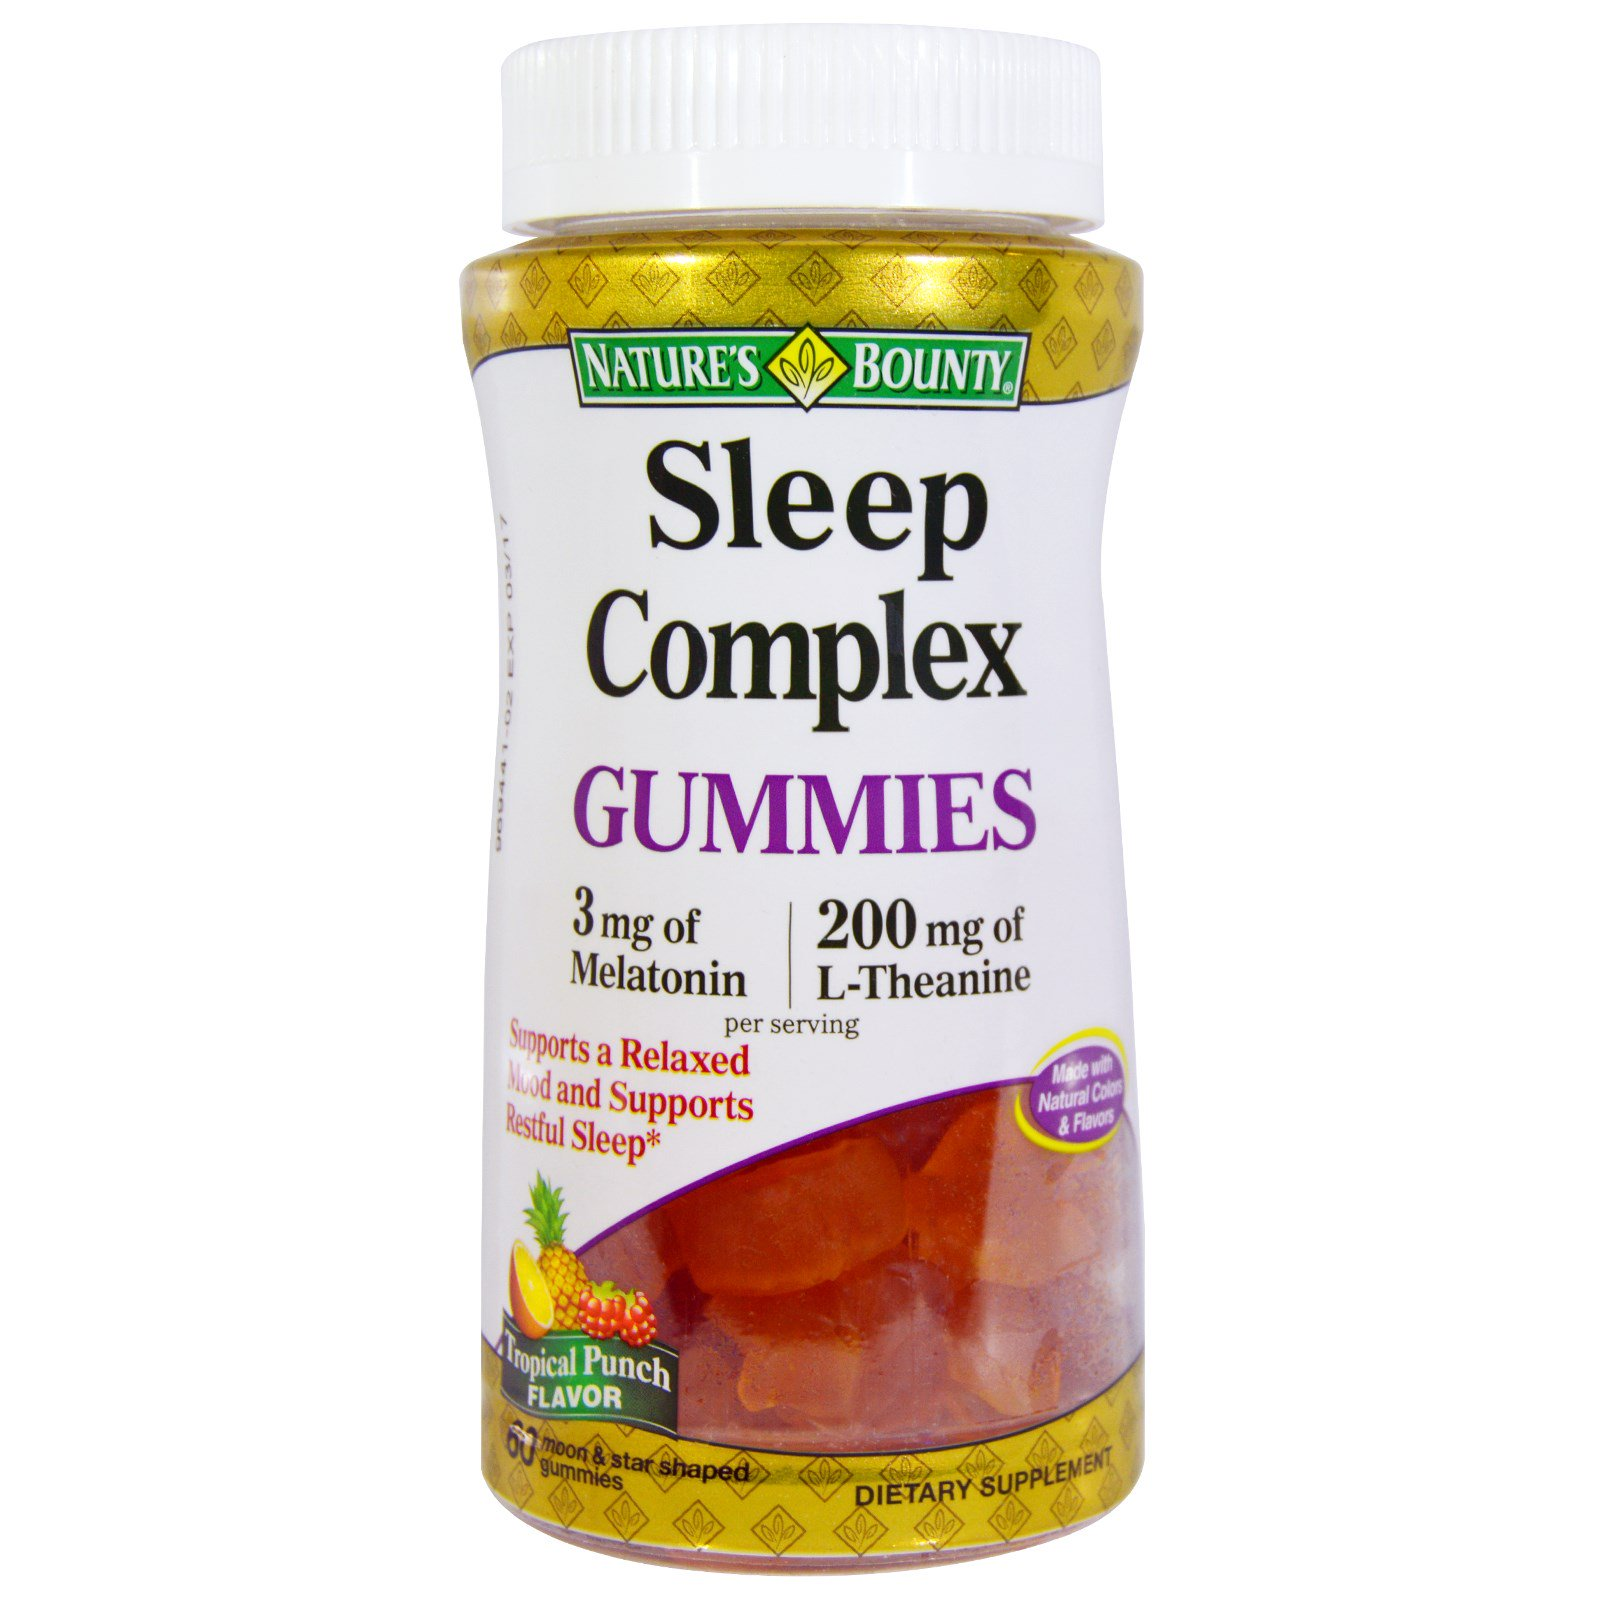 gummies bounty sleep nature complex star flavor shaped moon tropical punch iherb zoom